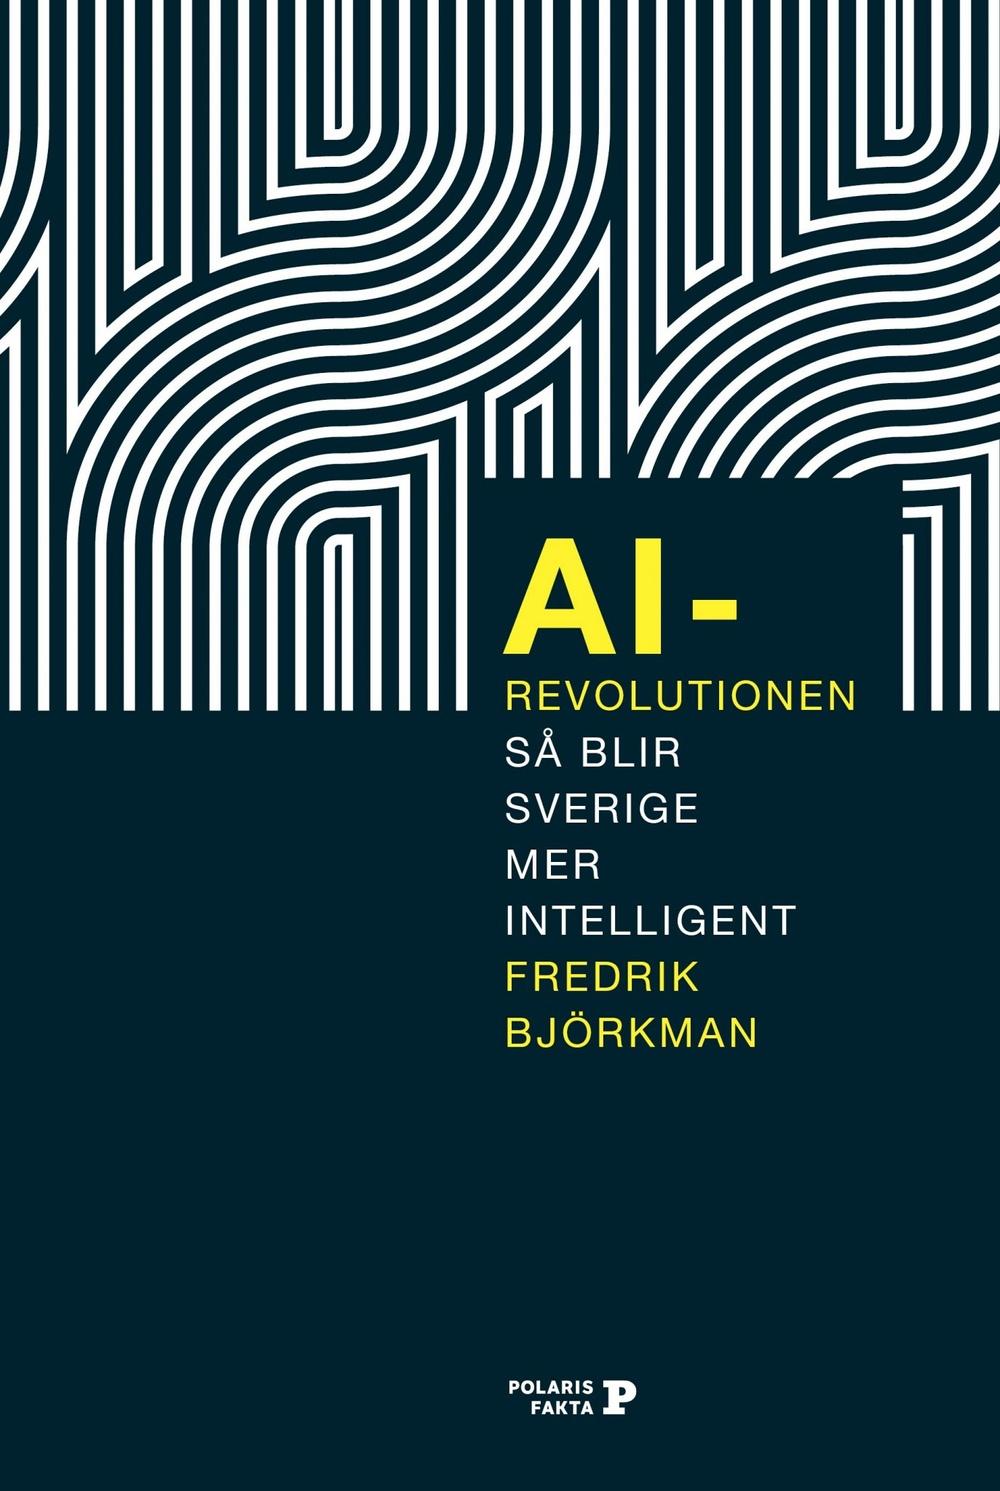 Bokomslag: AI-revolutionen